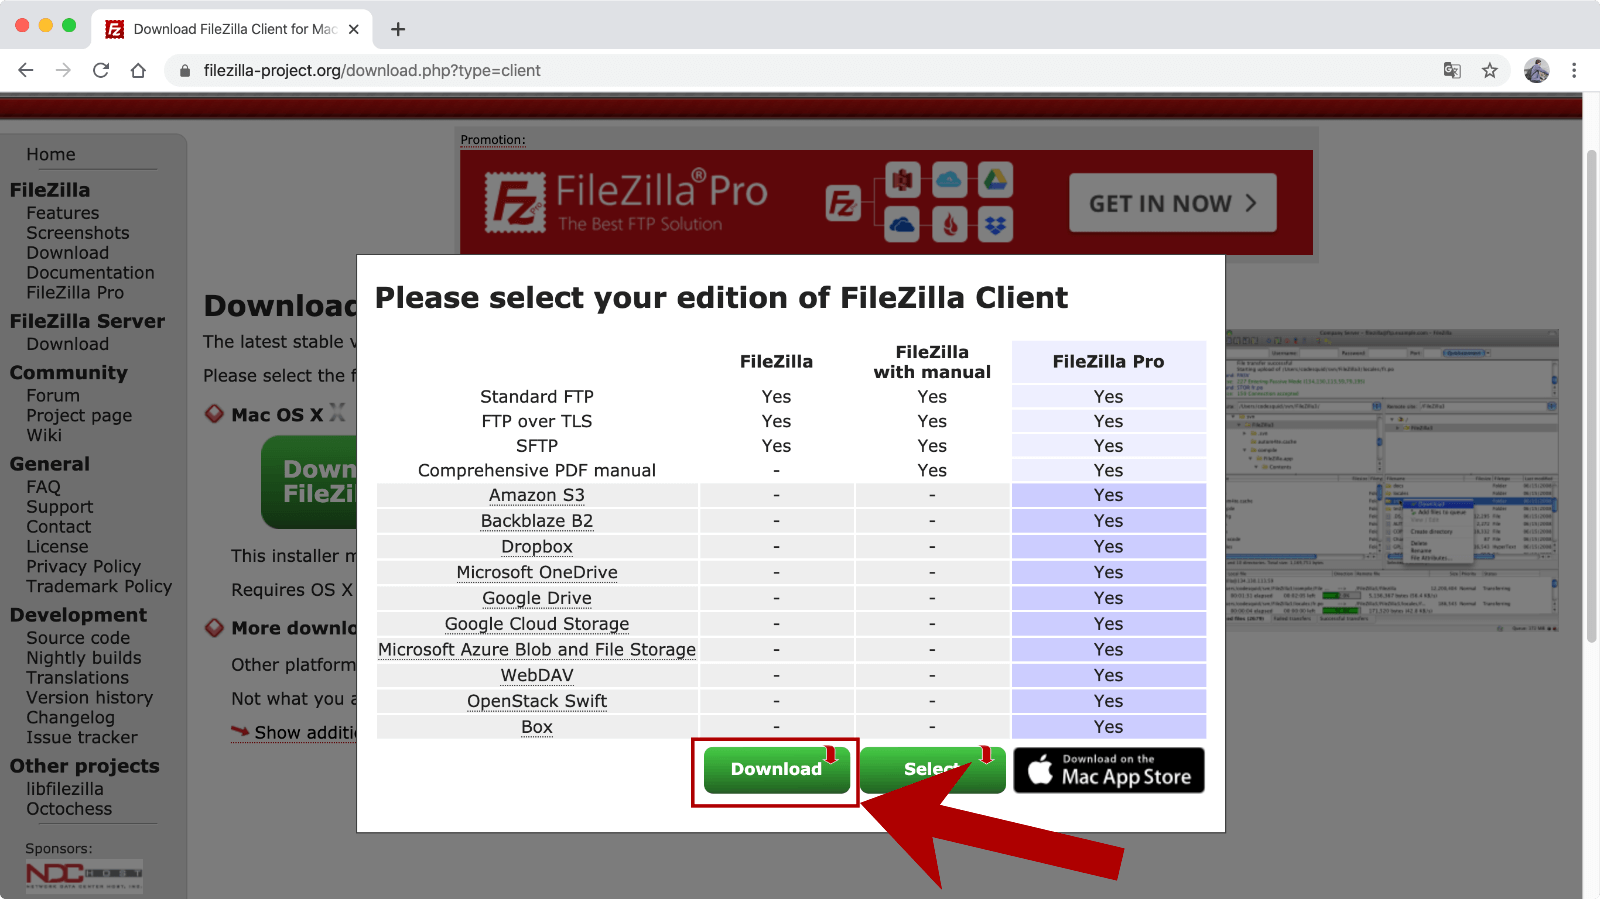 FileZillaのタイプを選んでダウンロード